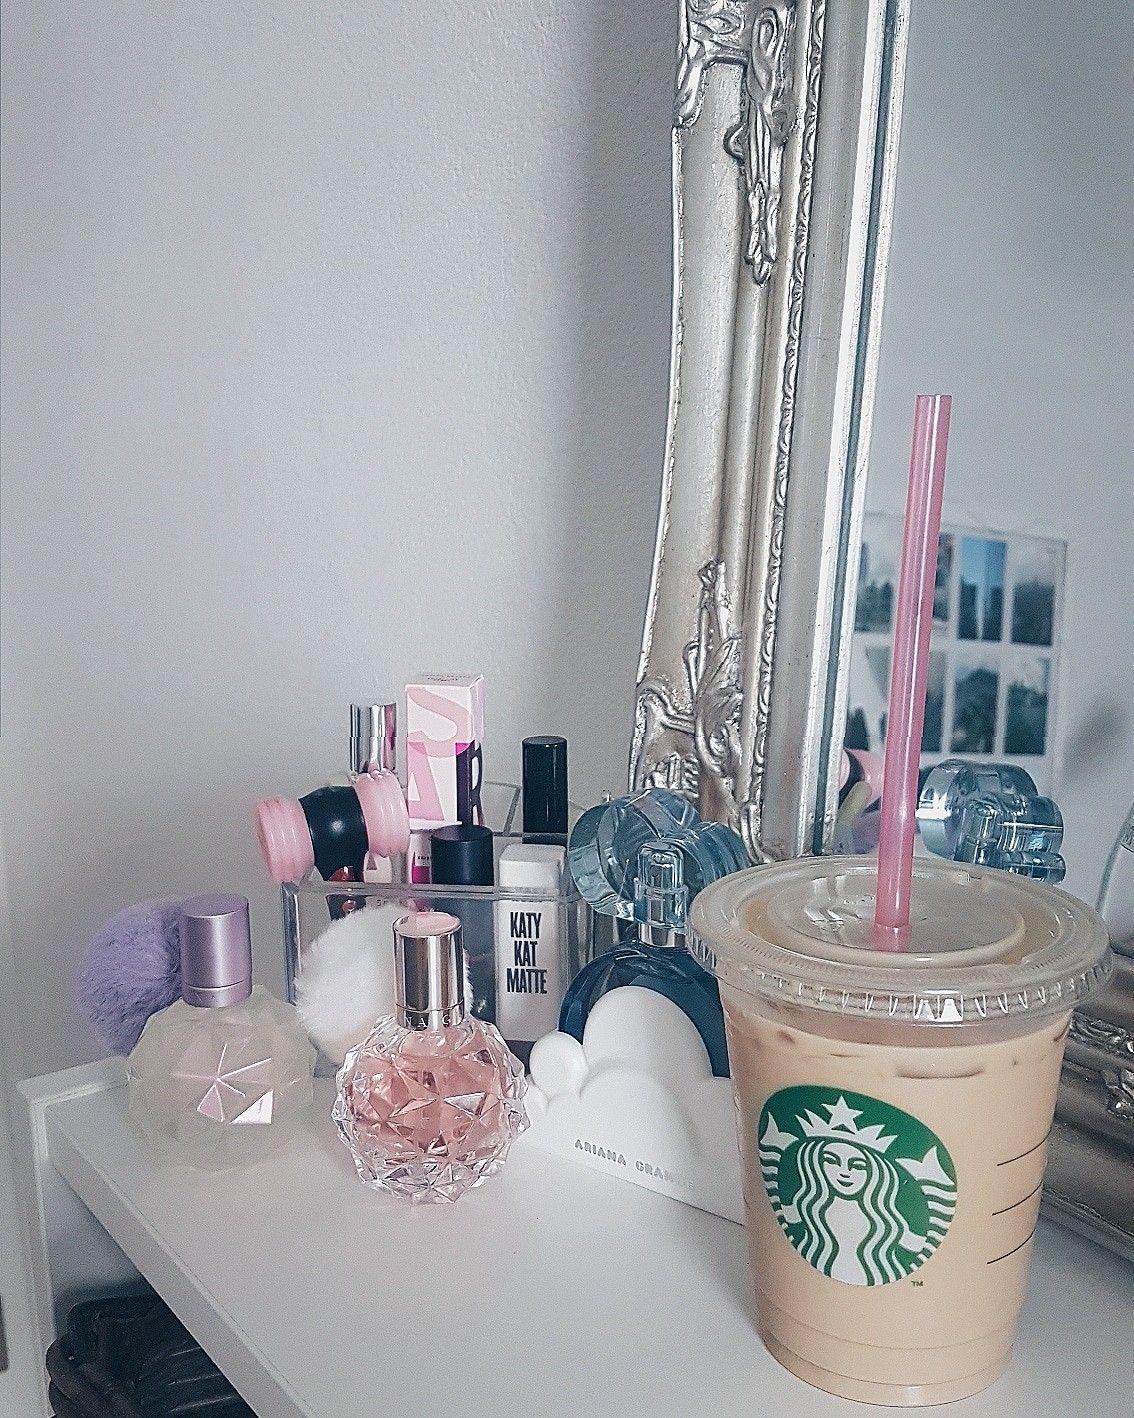 My Ariana Grande fragrance Collection♡ @sakura_ootd #arianagrande